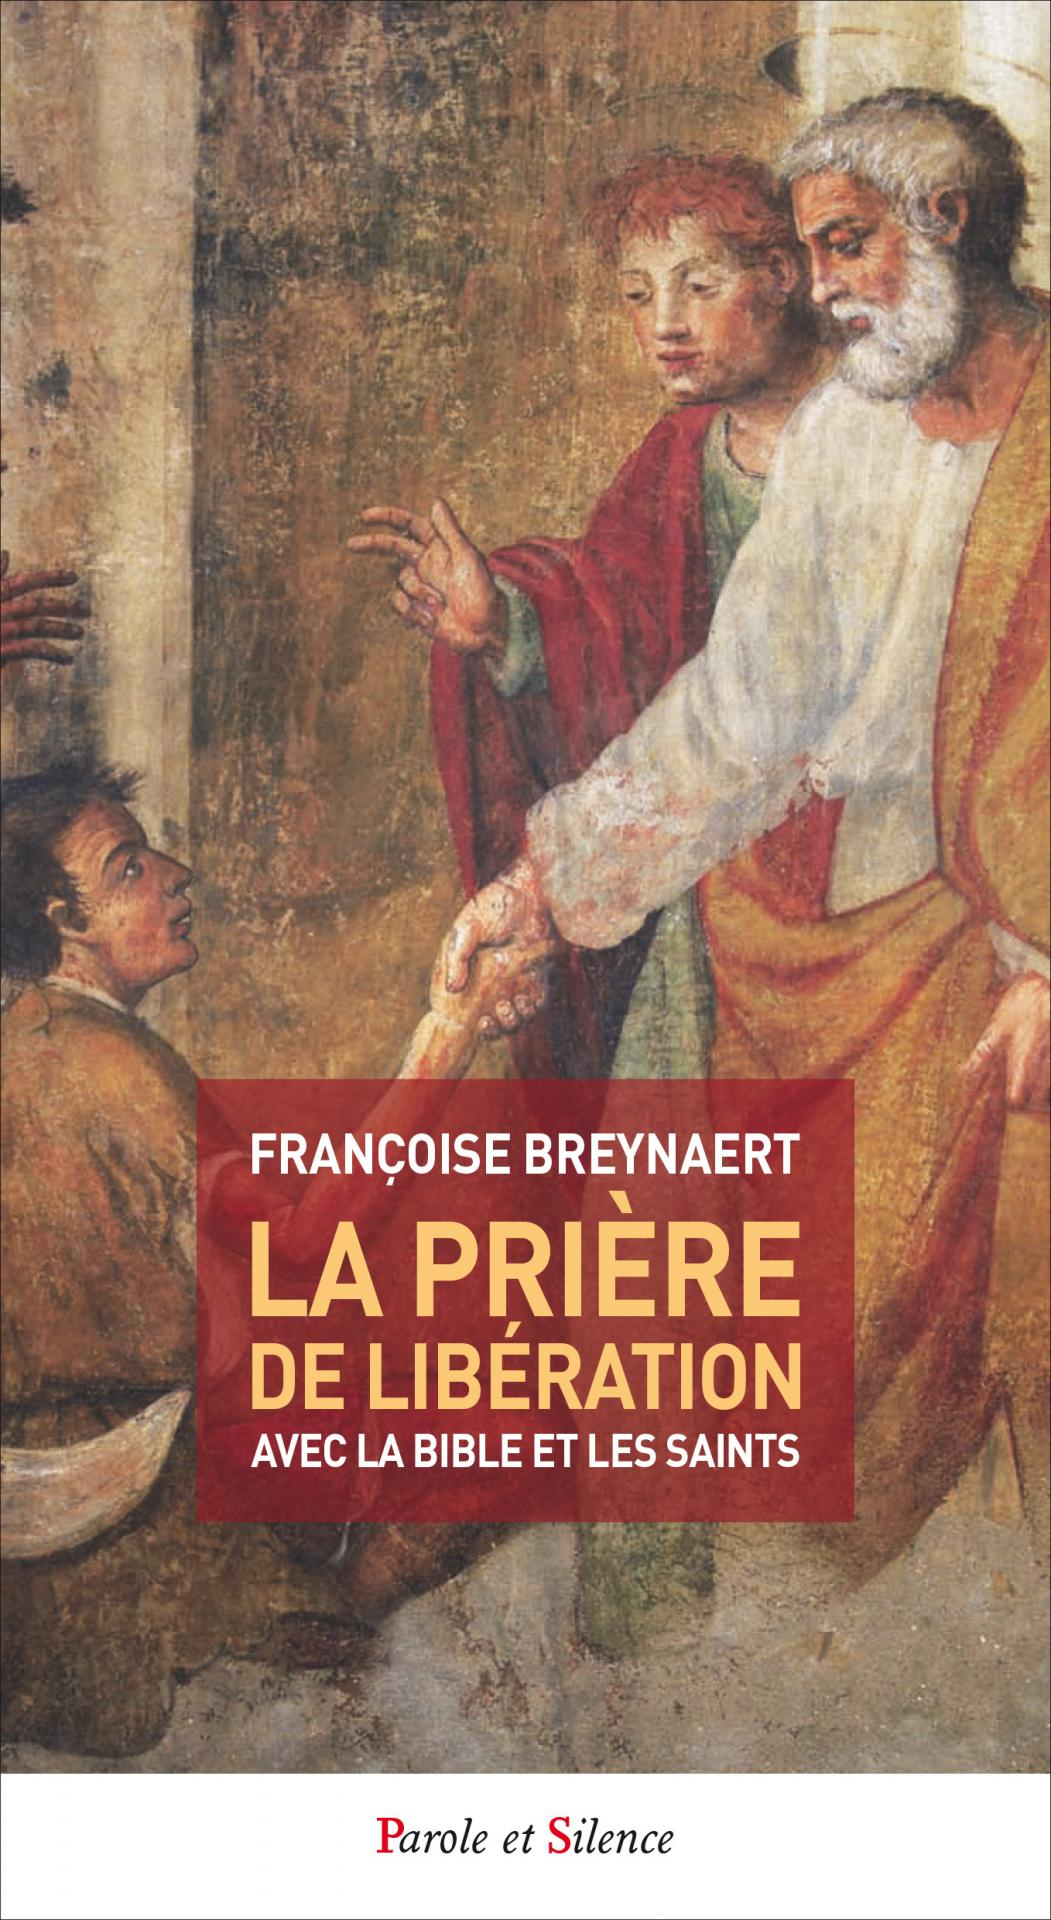 Couv breynaert la priere de liberation